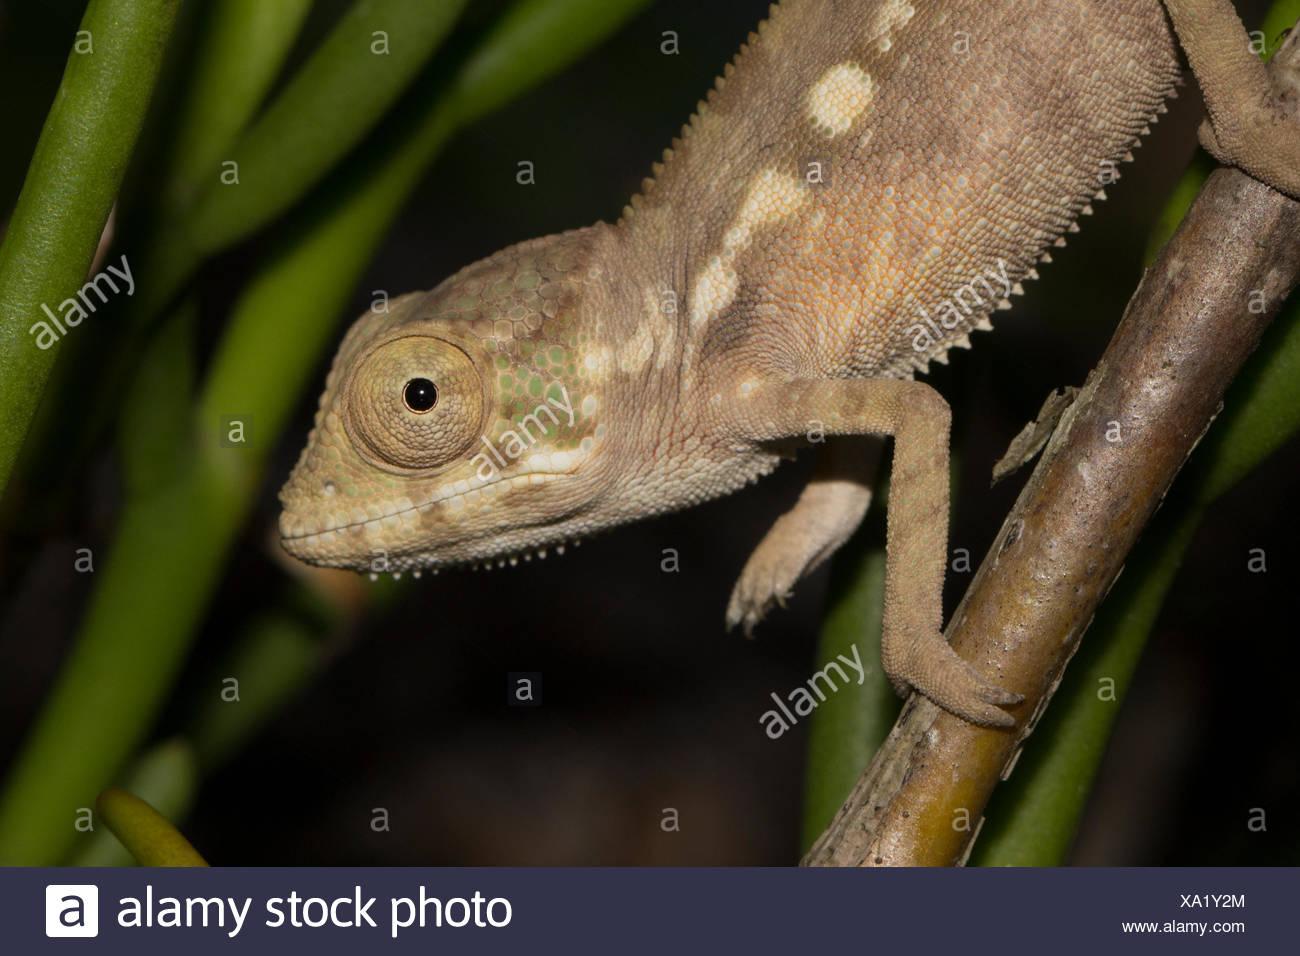 Panther chameleon (Furcifer pardalis), offspring, Sambava, northeast Madagascar, Madagascar - Stock Image